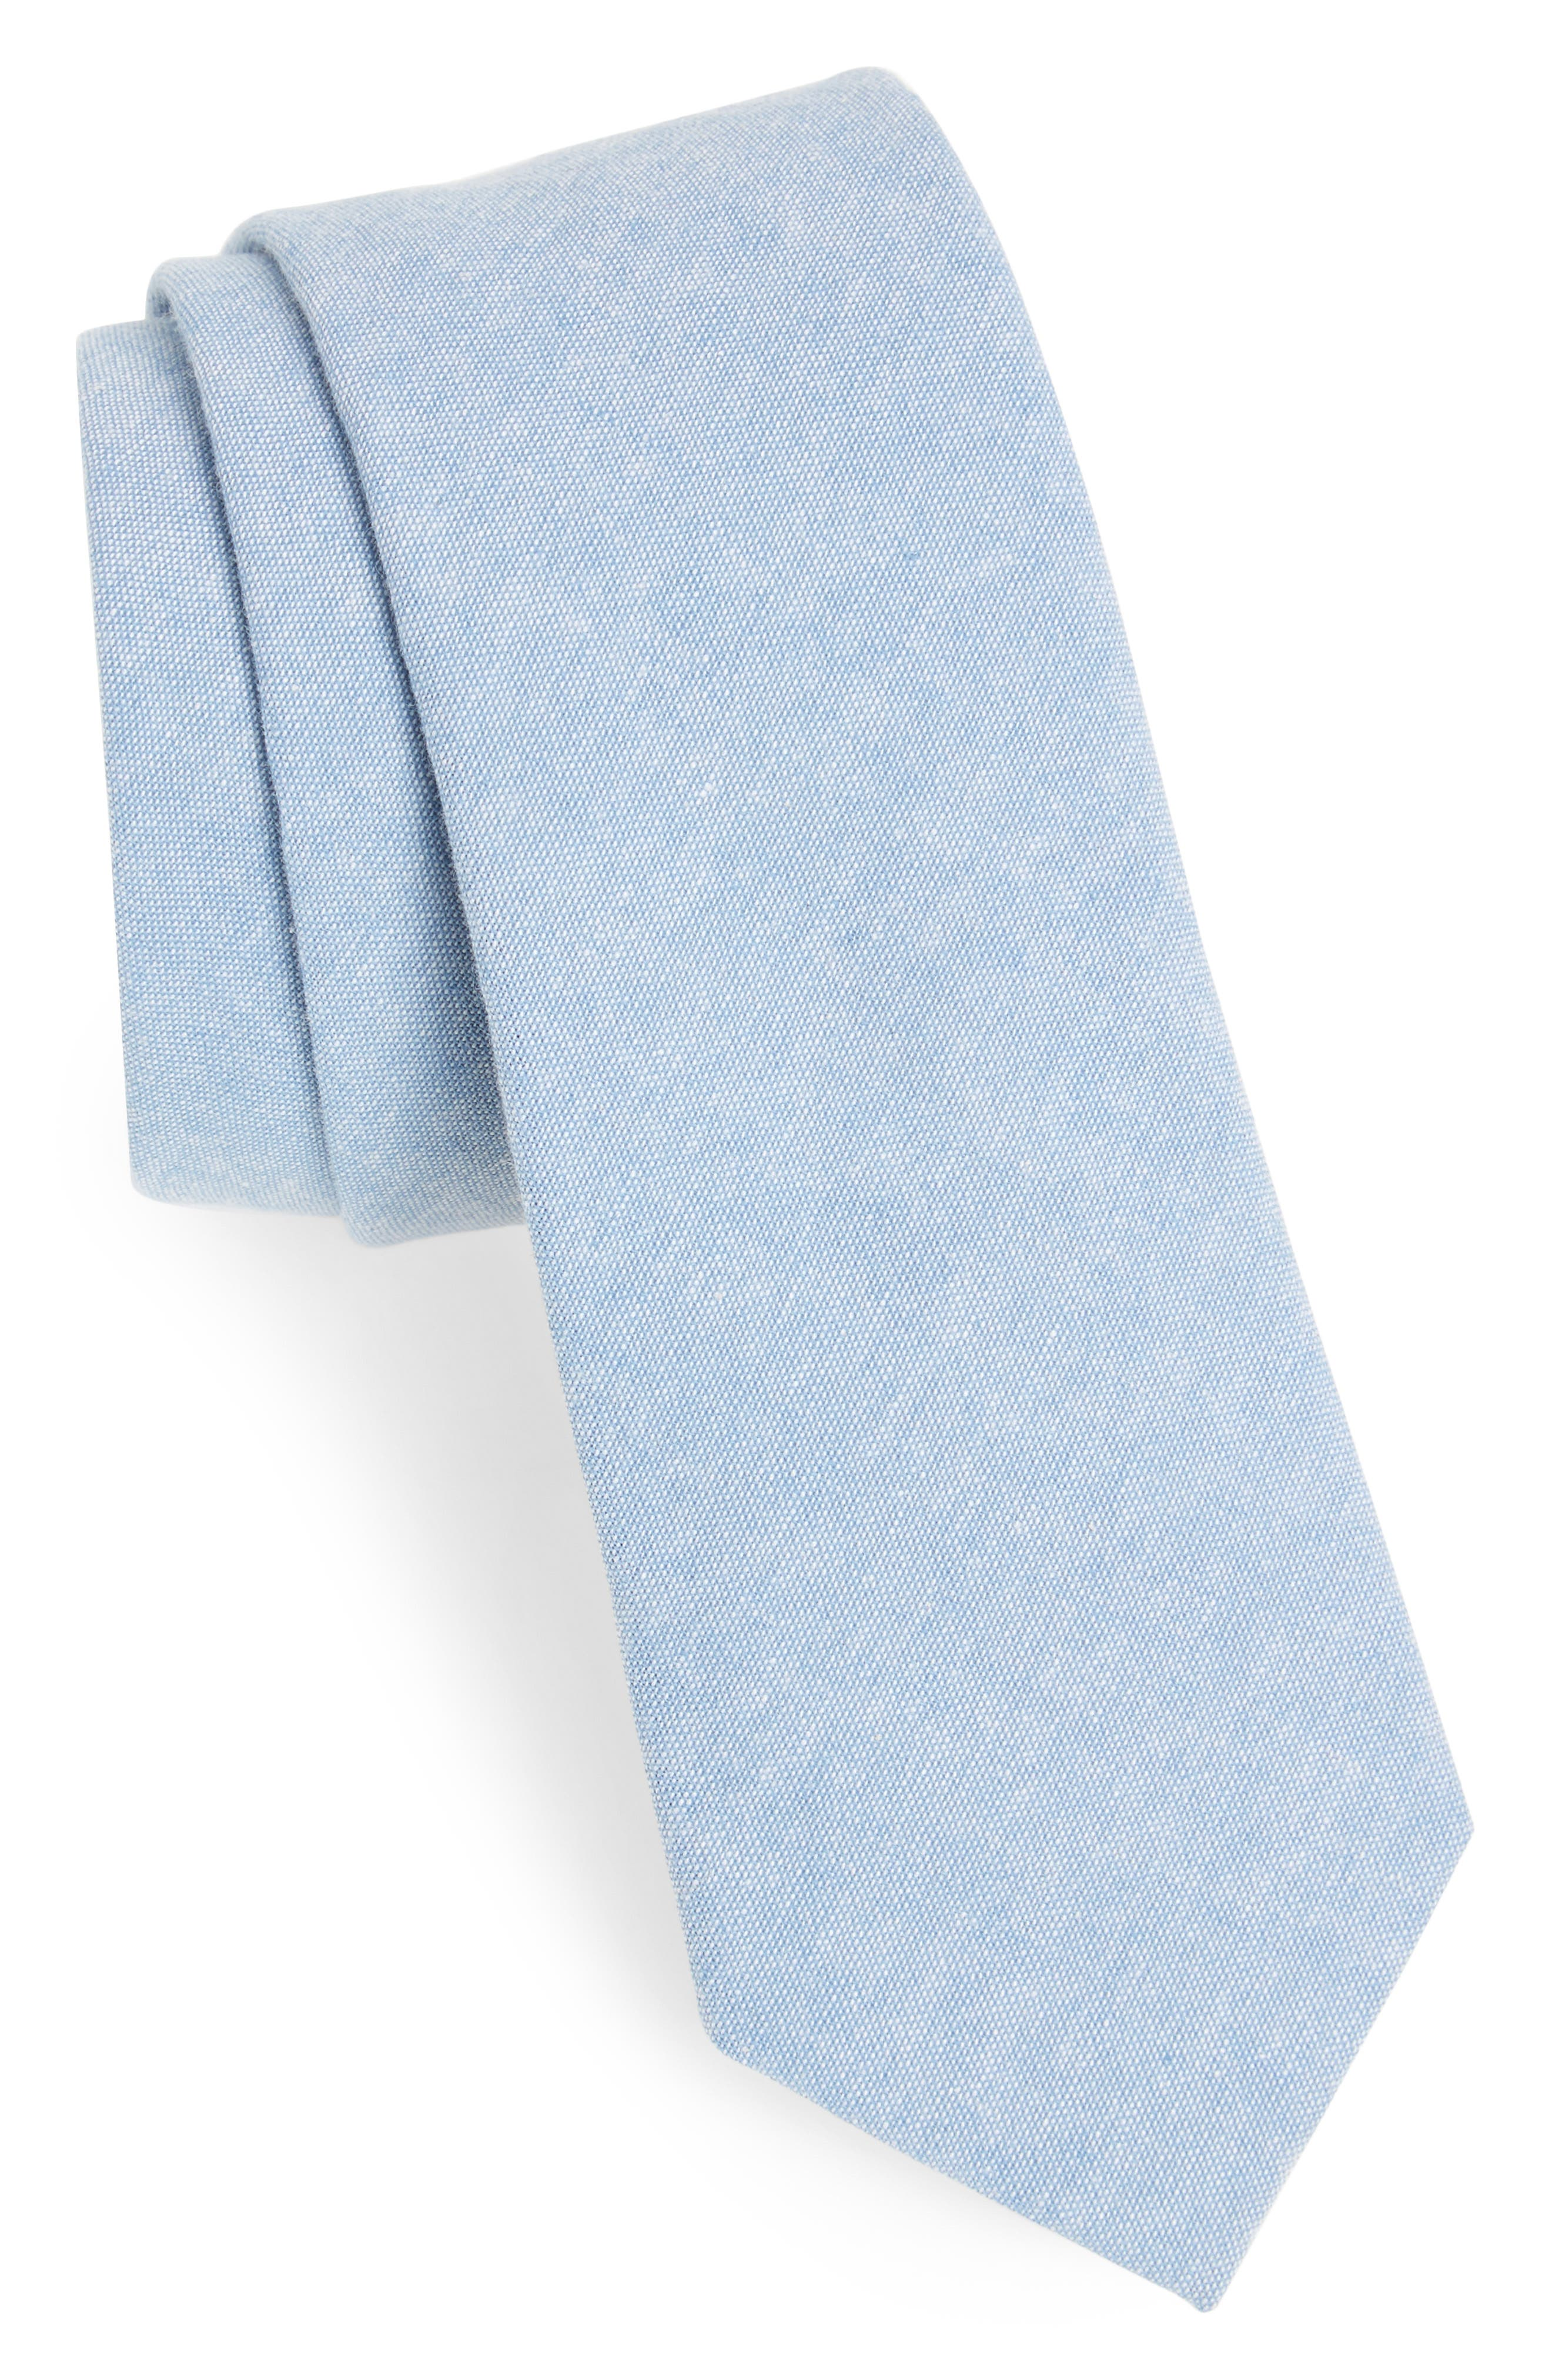 Laguna Solid Cotton Skinny Tie,                             Main thumbnail 1, color,                             Blue